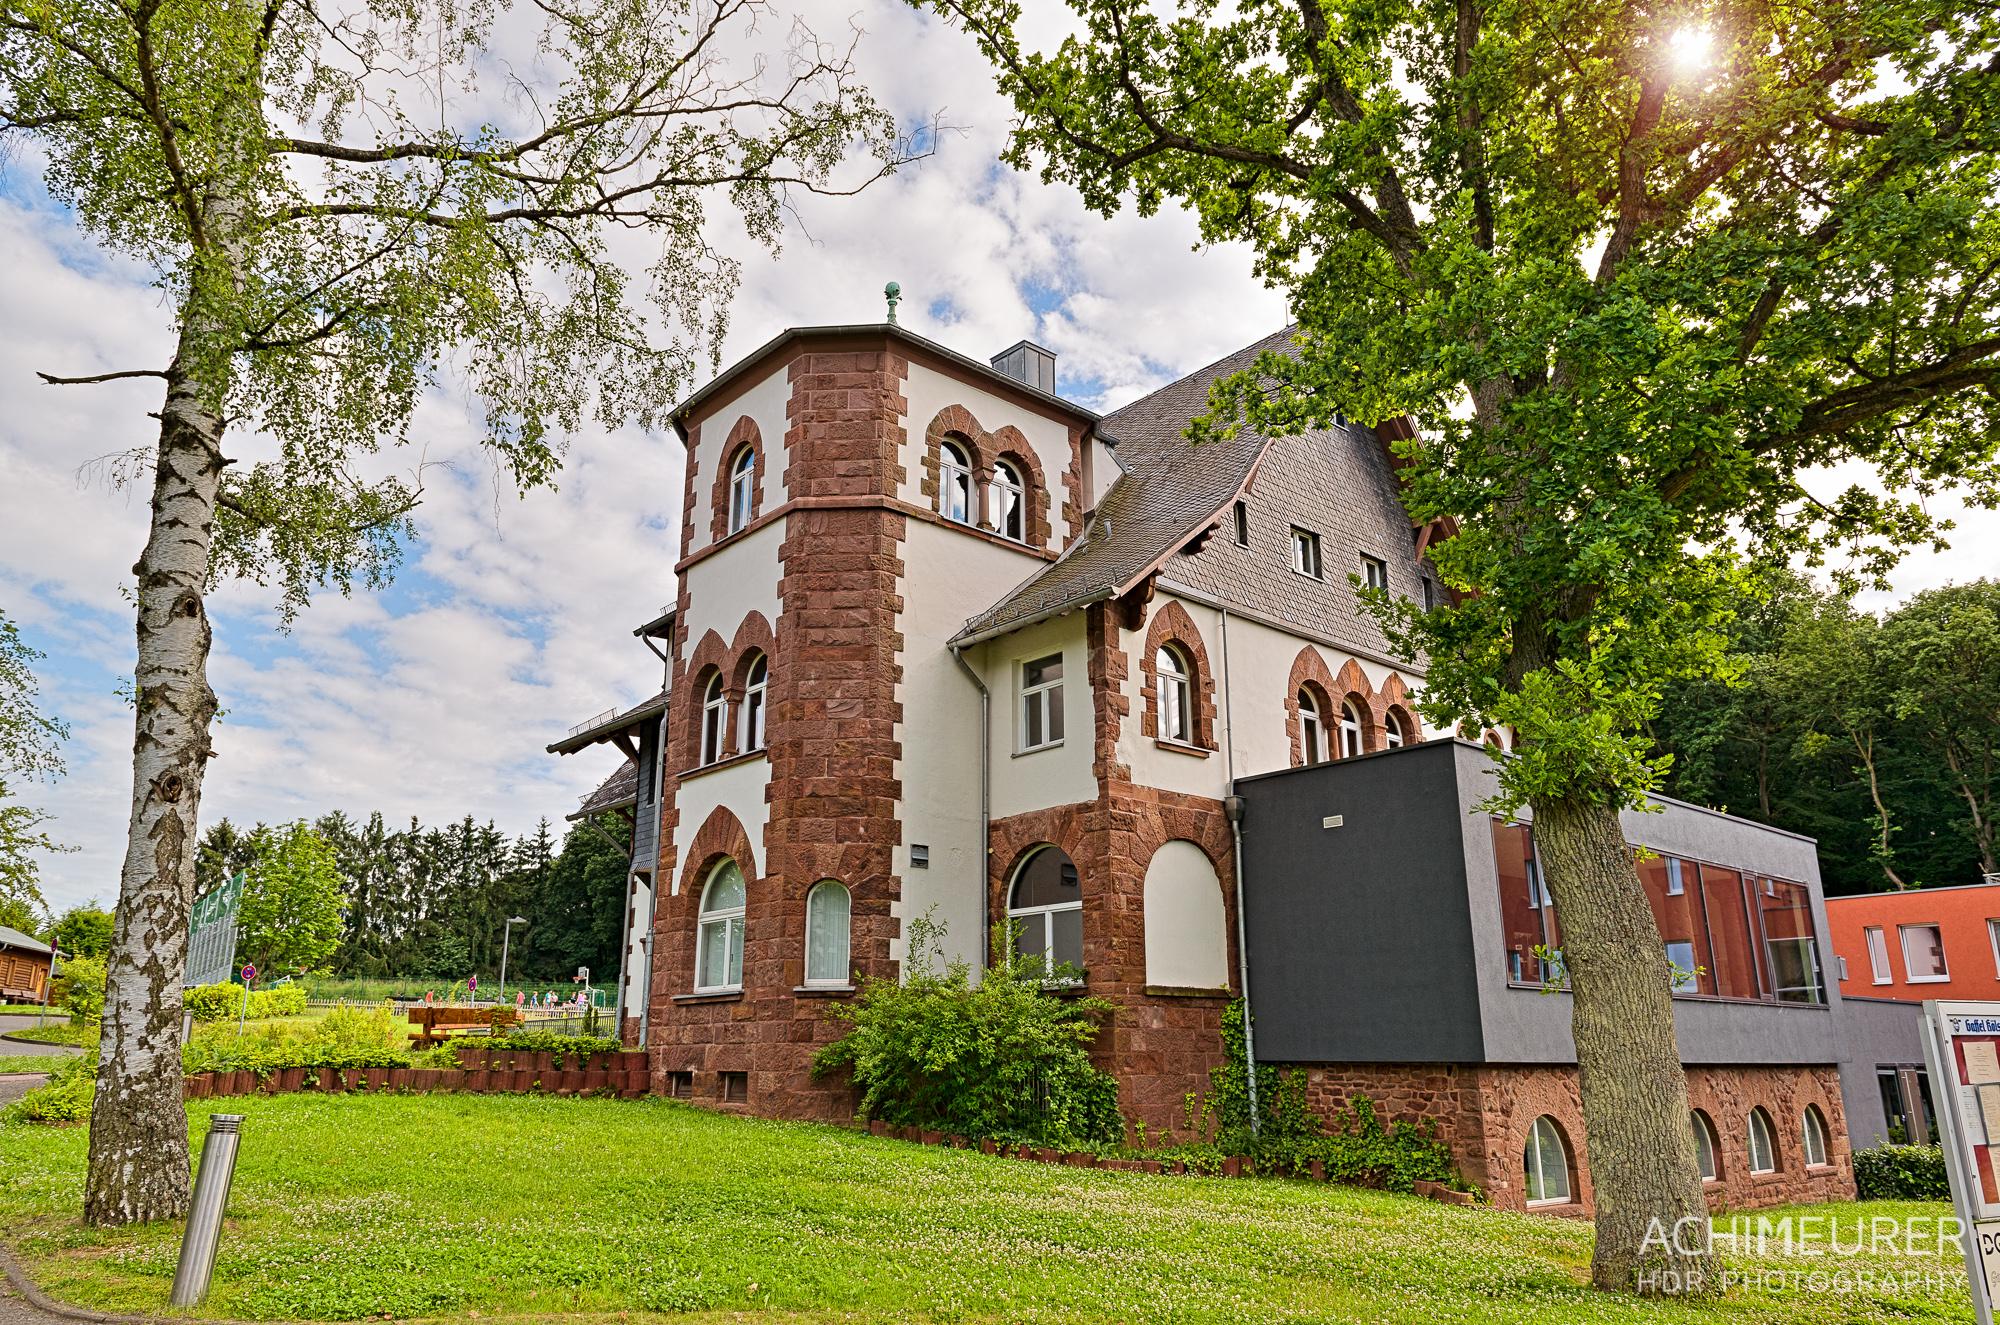 Eifel-Rheinland-Pfalz-Rureifel_5472_1_0_HDR-Bearbeitet